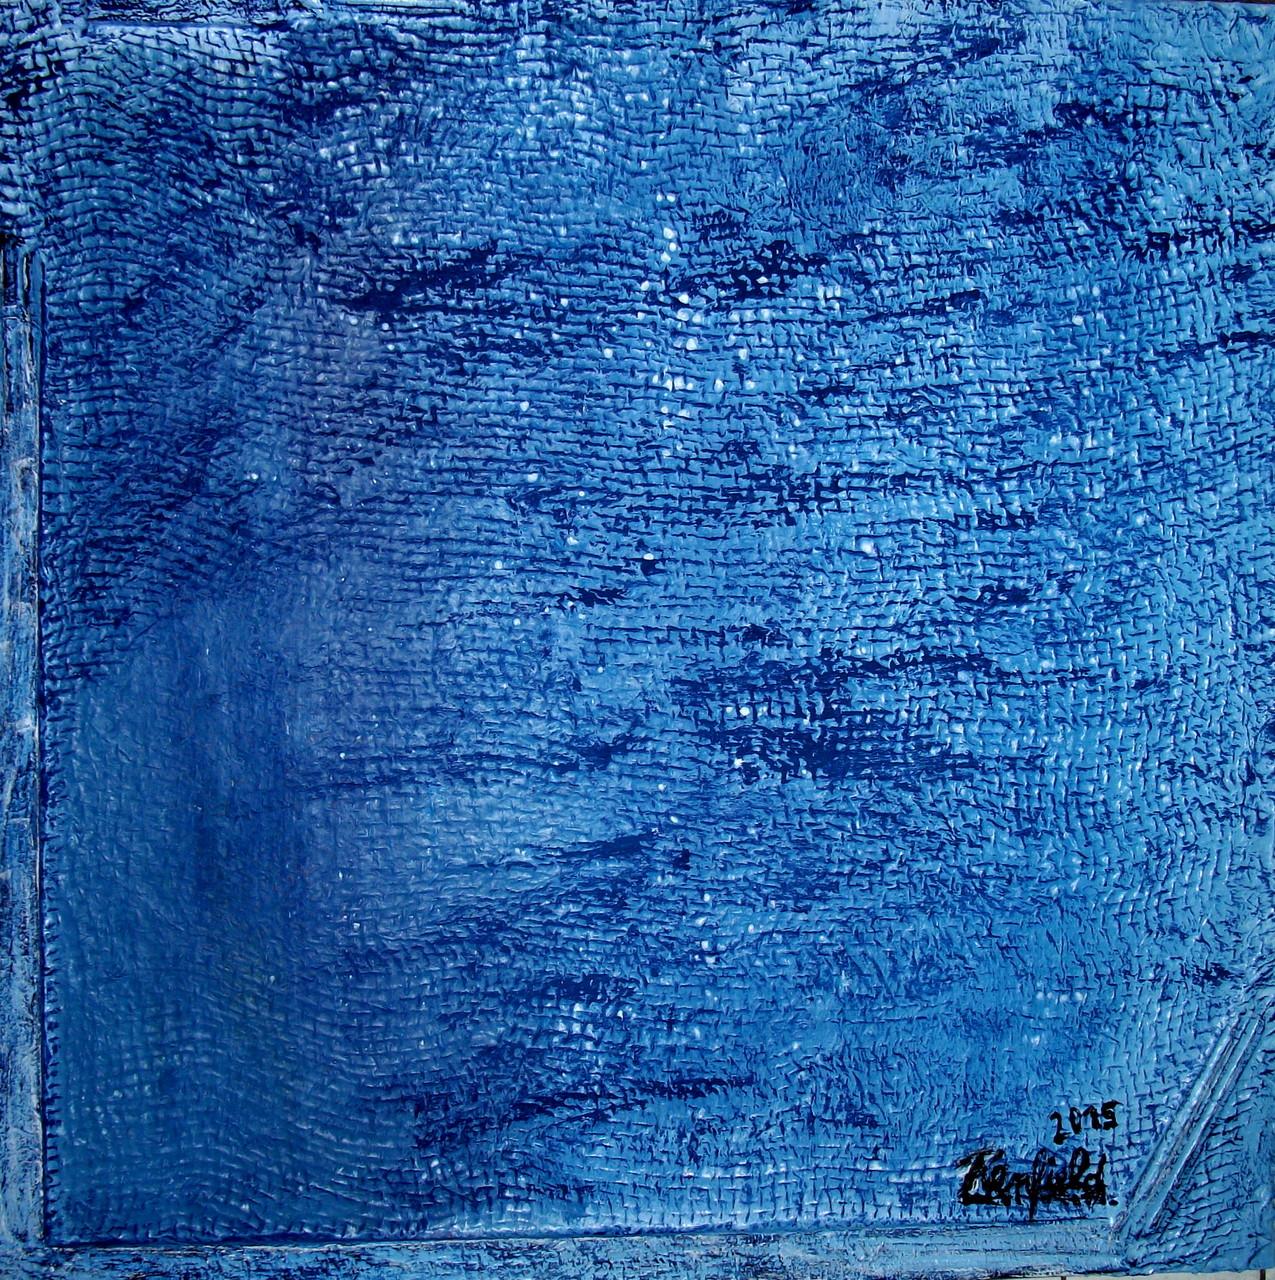 Blue 5 (60 x 60) Acryl auf Leinwand mit Struktur